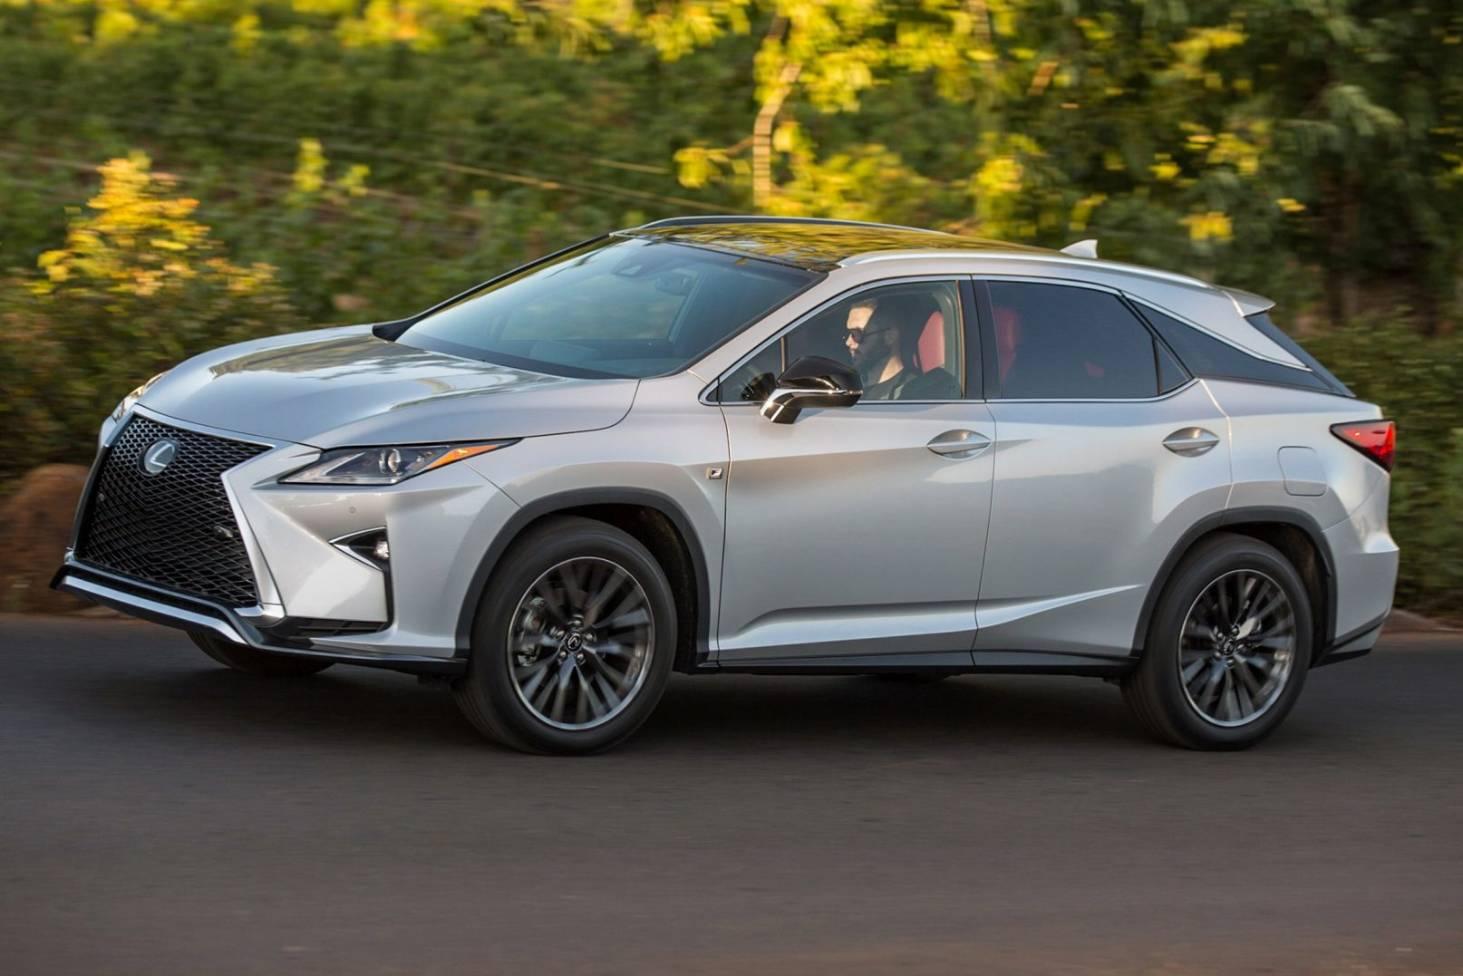 Lexus Nz Goes Large On New Suv Models Stuff Co Nz